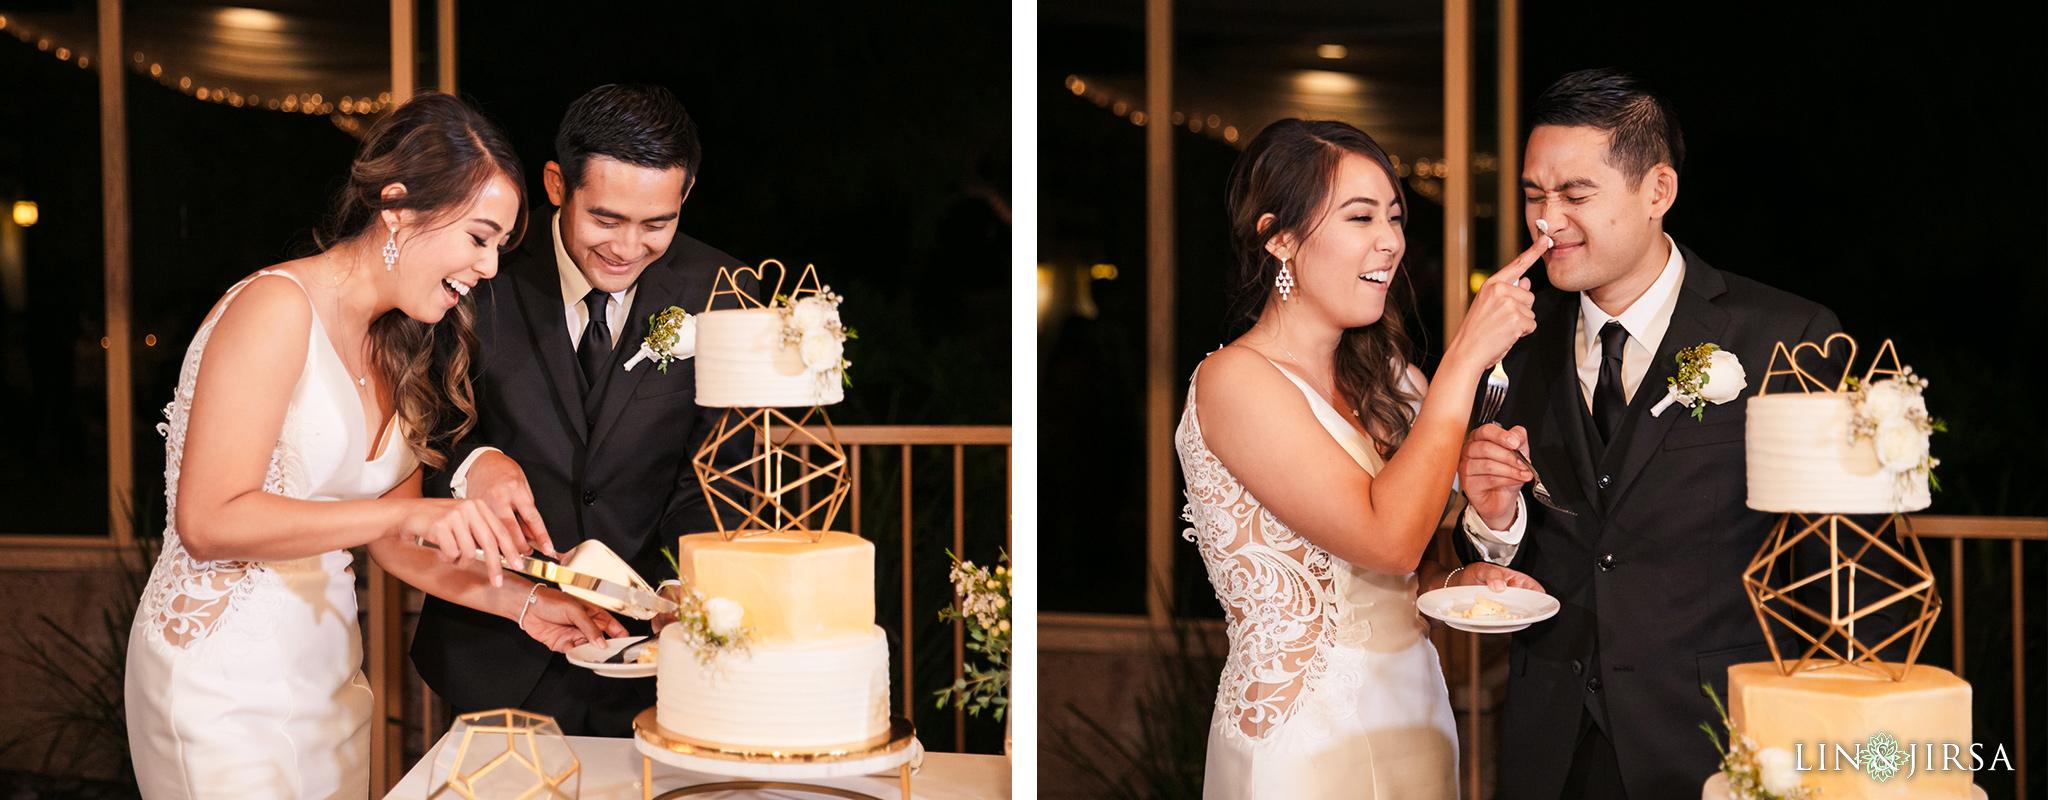 Coto de Caza Golf Club Wedding Photography Cake Cutting